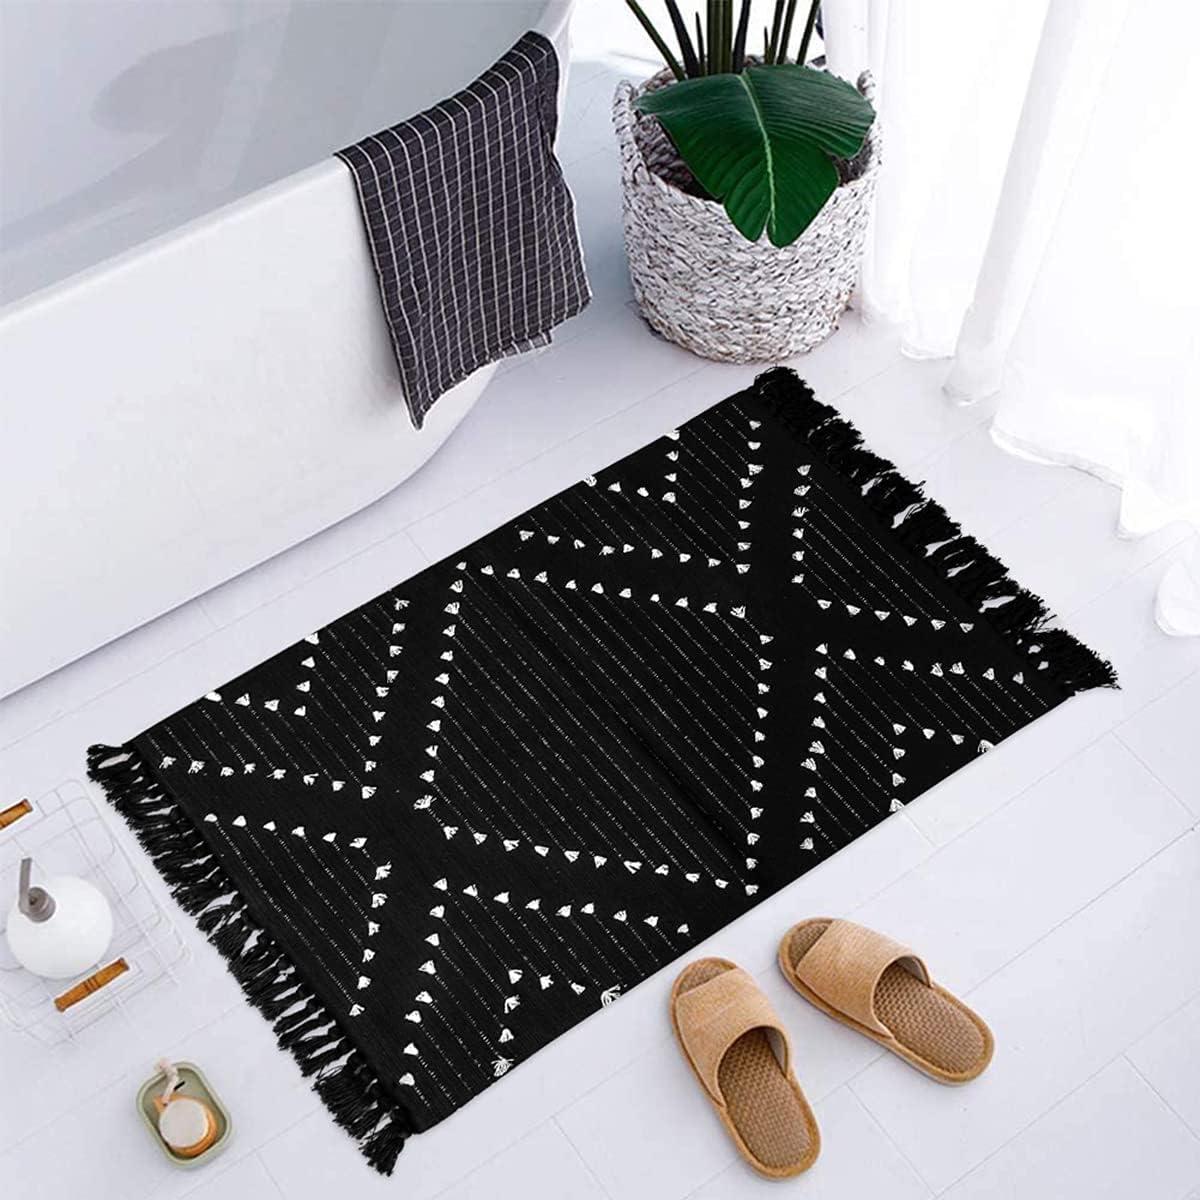 LIVEBOX Boho Bathroom Rug 20' x 20' Washable Small Black Area Rug Moroccan  Kitchen Cotton Woven Rug with Tassel Throw Rug for Hallway Bedroom Laundry  ...